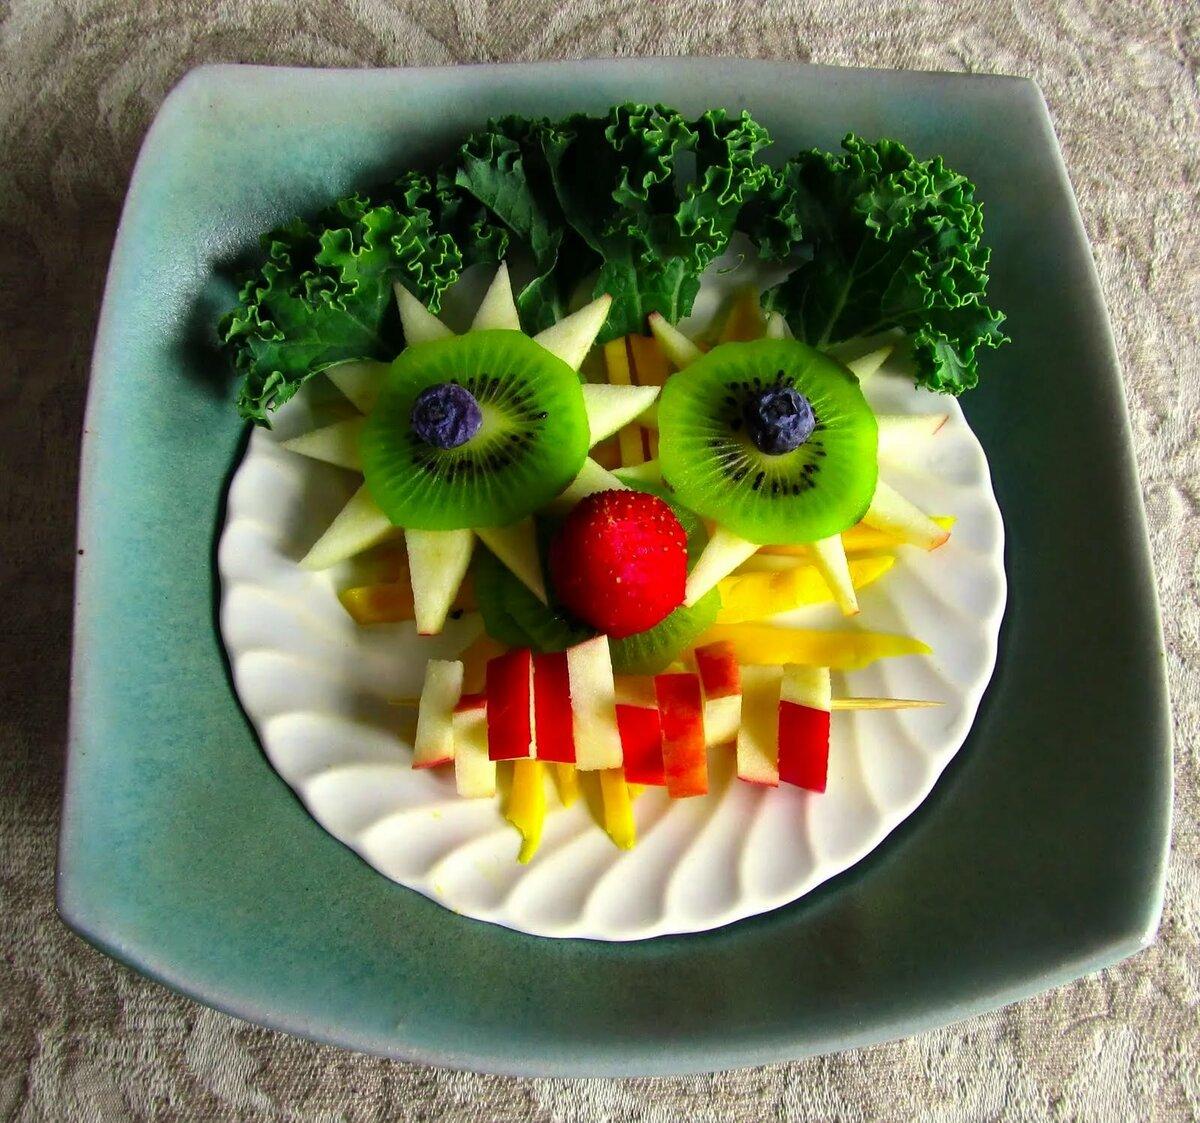 картинки для нарезки фруктов с рецептами работа для